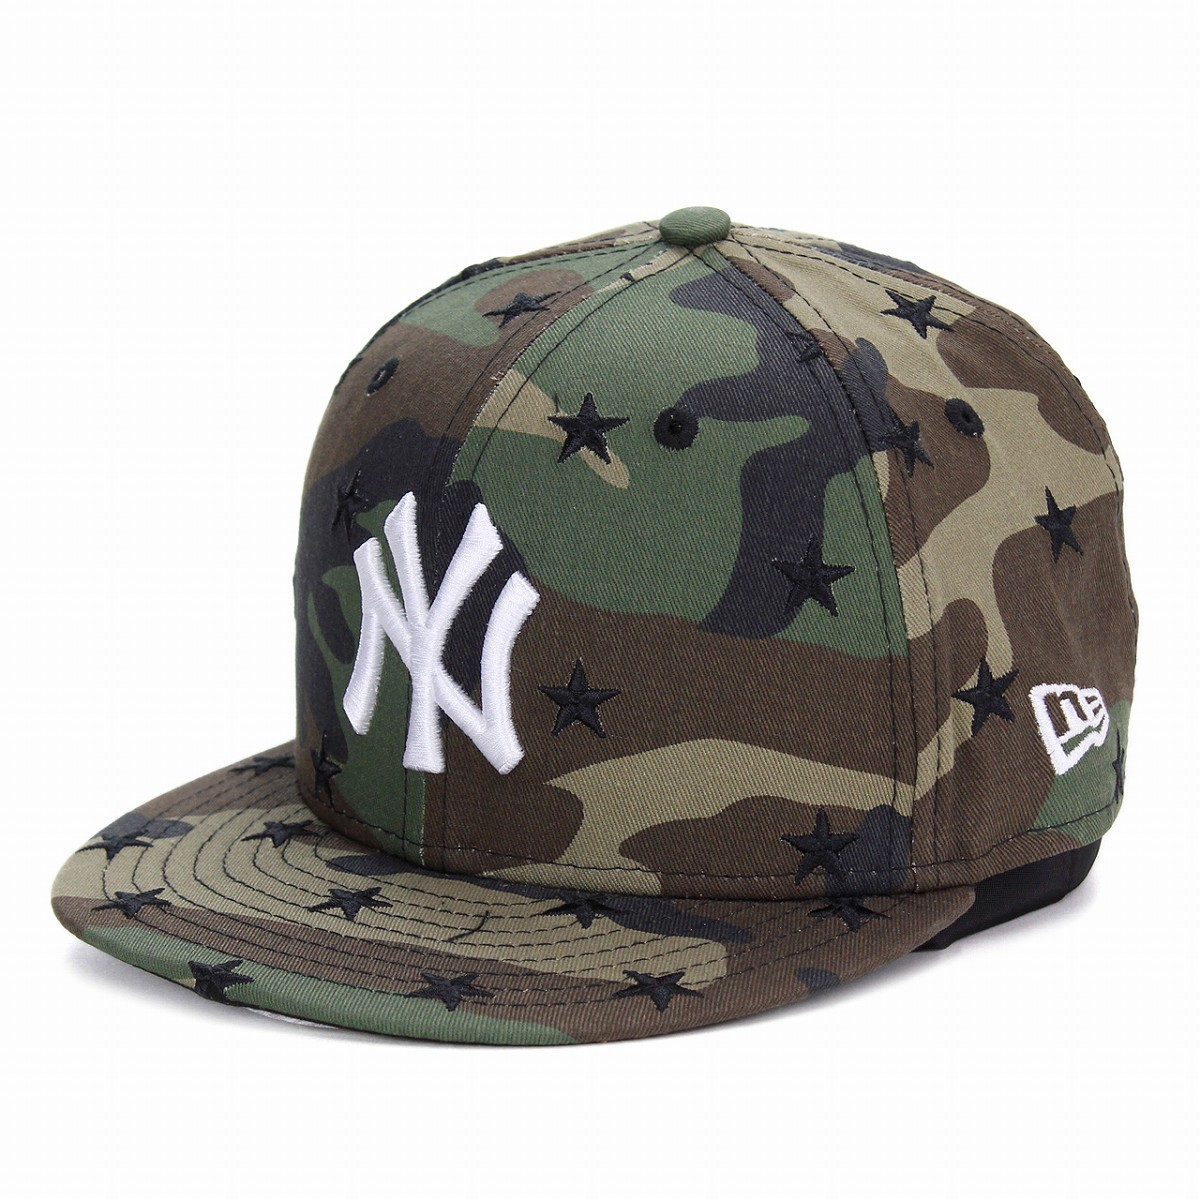 243b9c80bfbbf ELEHELM HAT STORE  NEWERA kids cap KIDS hat patterned stars 59FIFTY ...